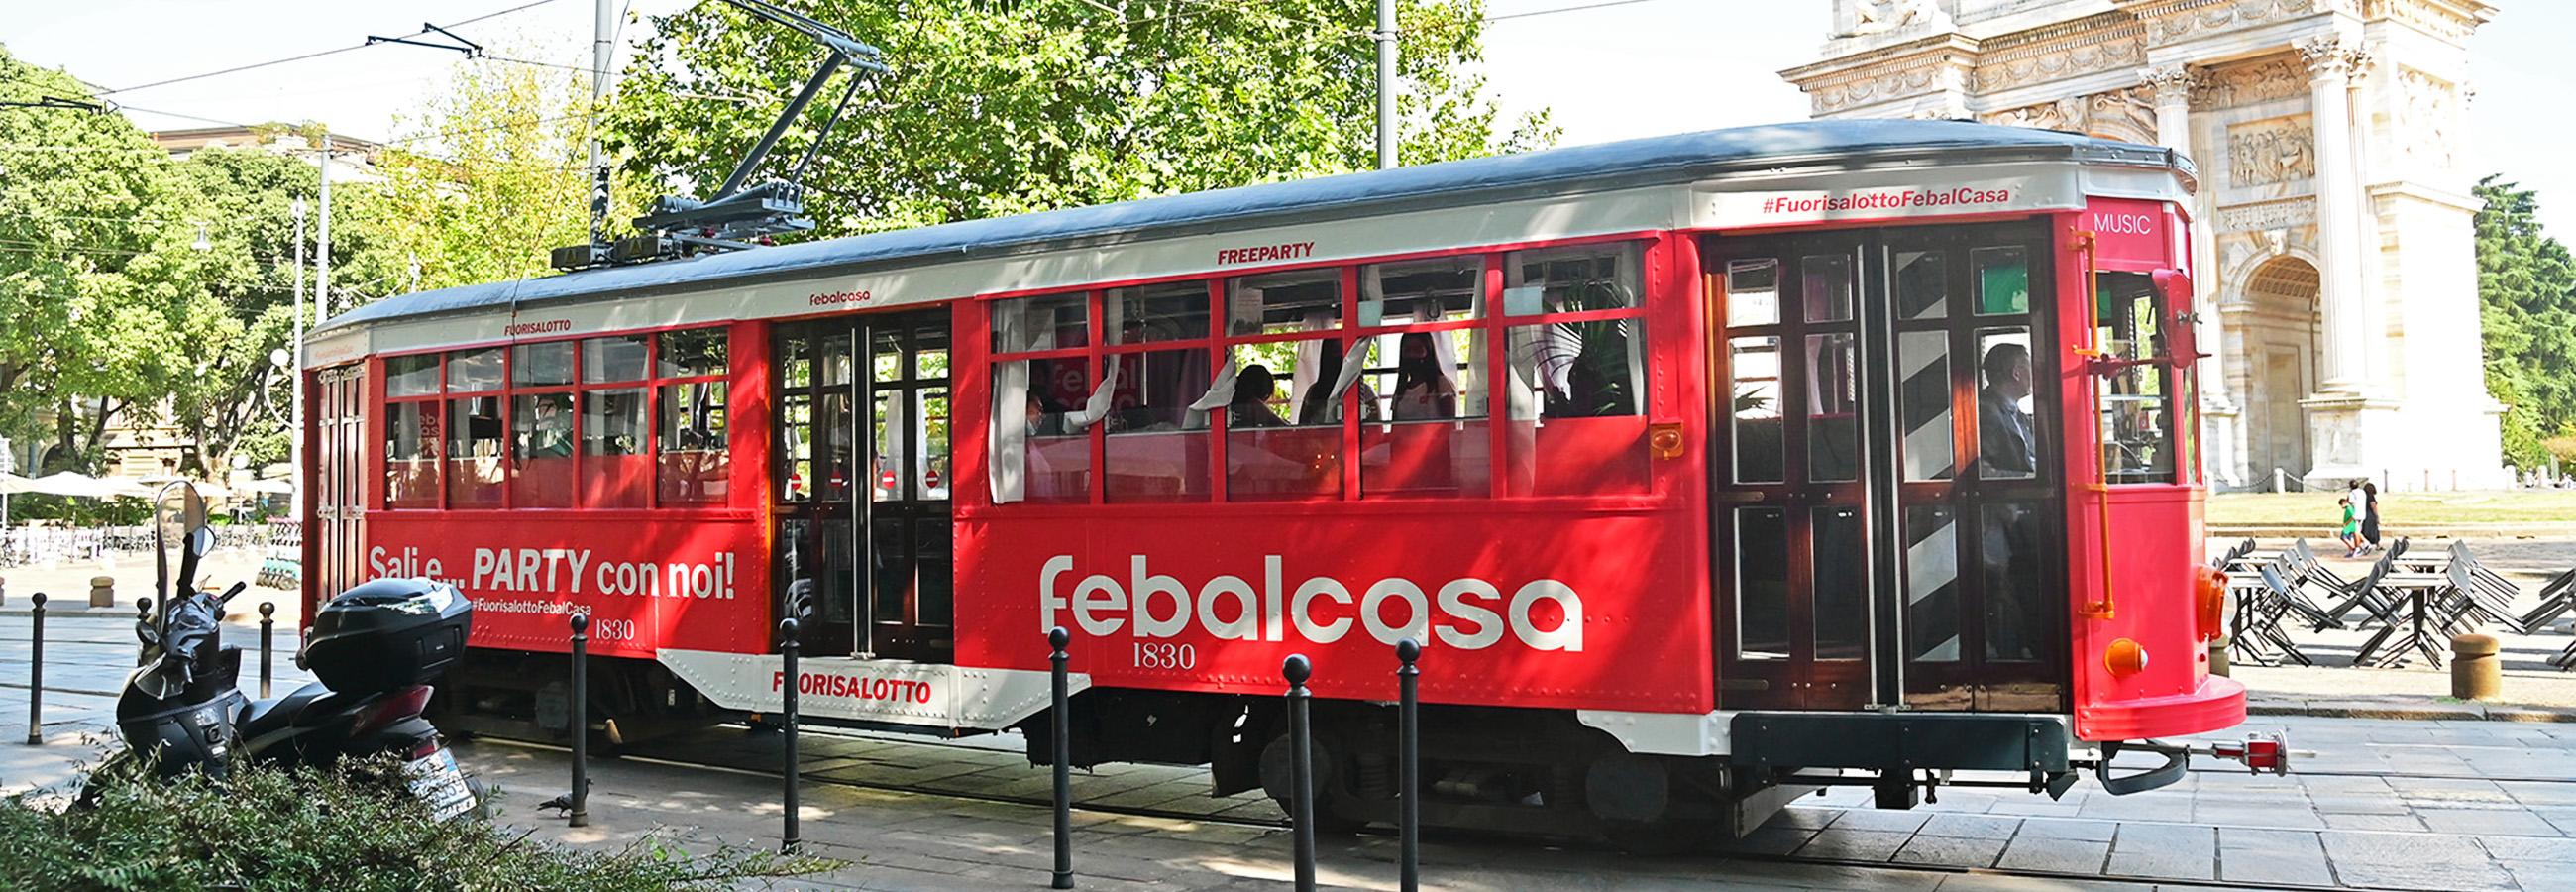 Tram fullwrap Milano Febal Casa